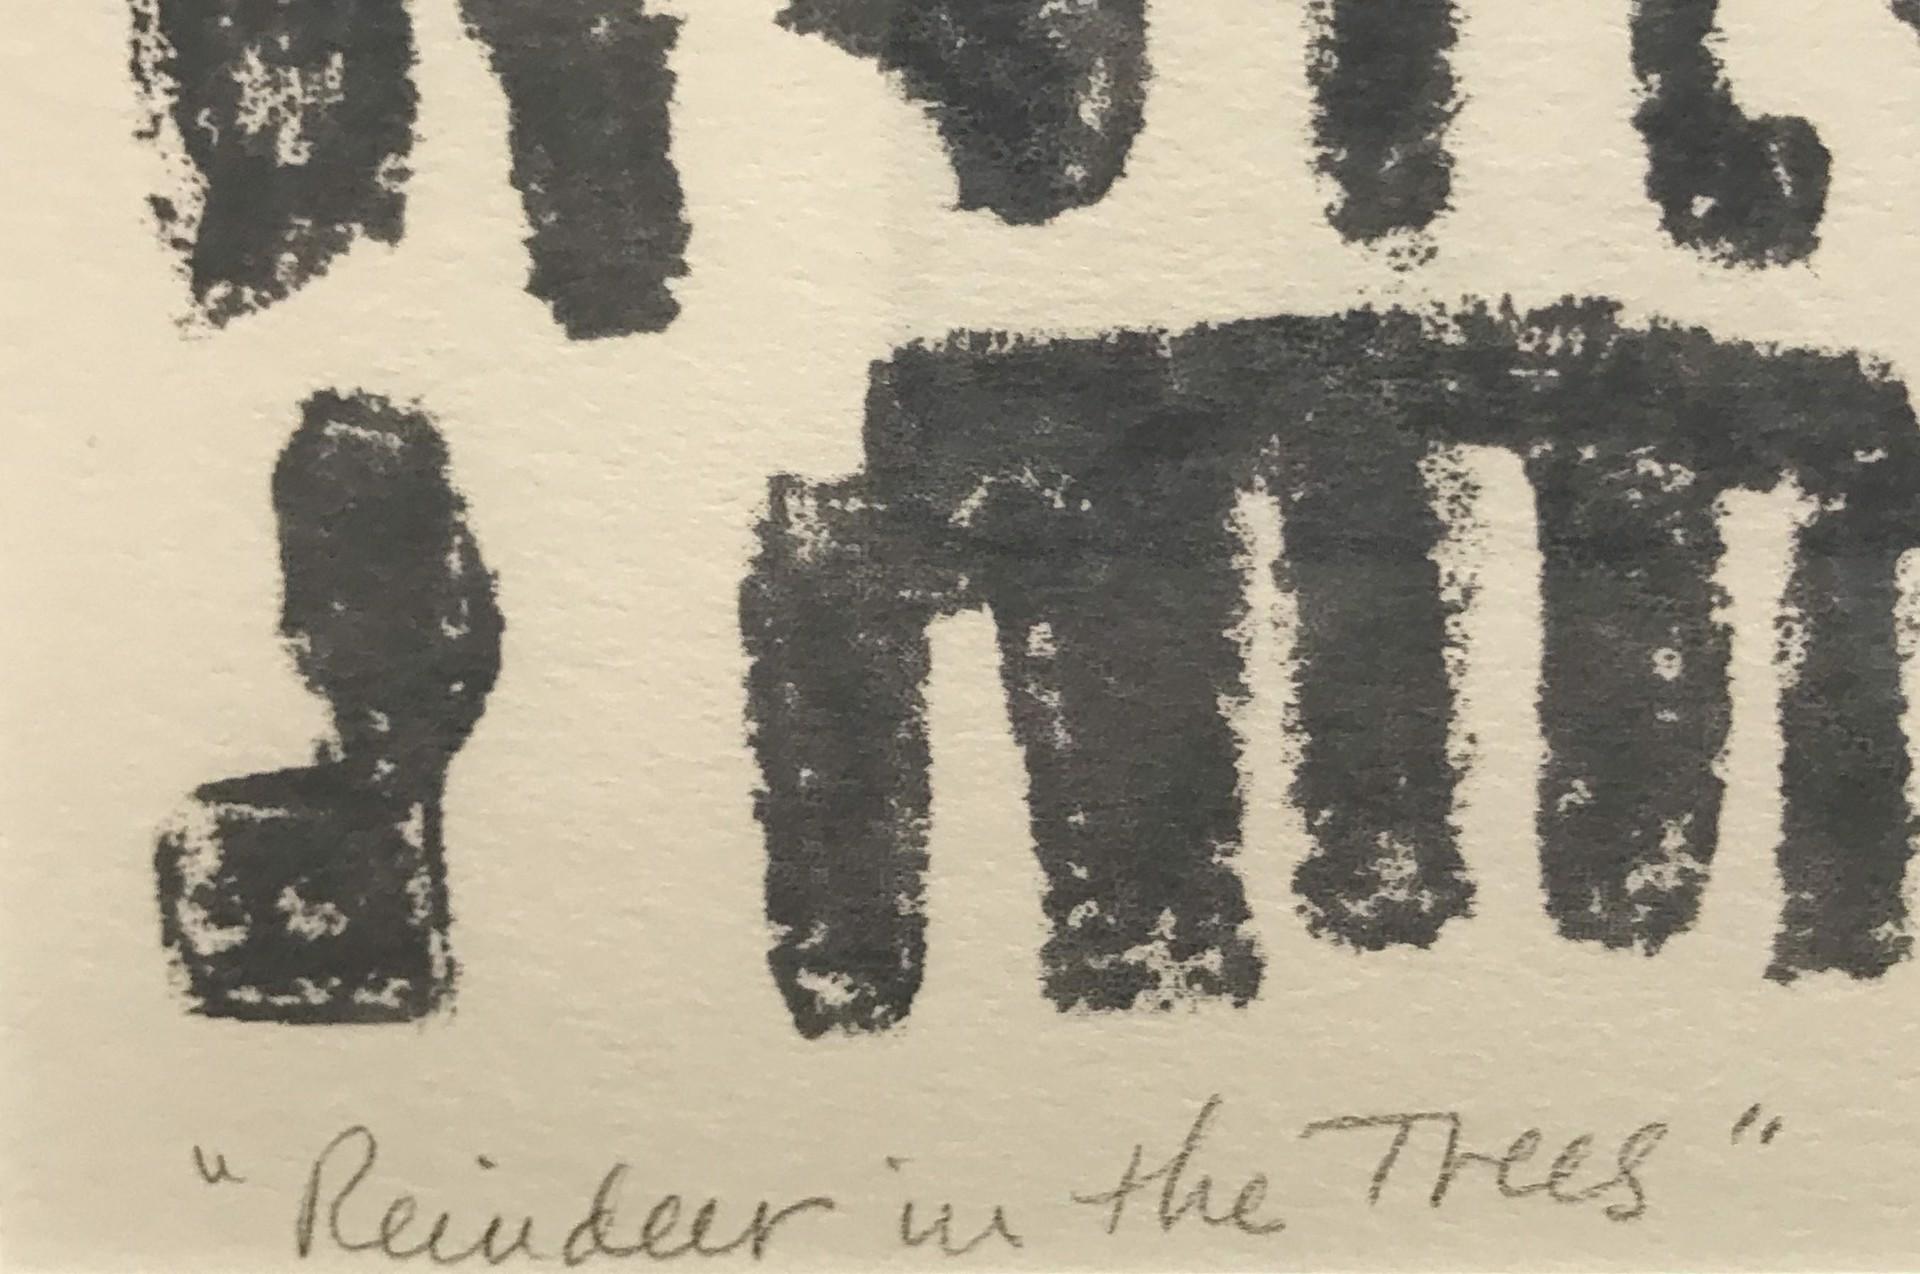 Reindeer in the Trees (grey) by Stella Sullivan Prints